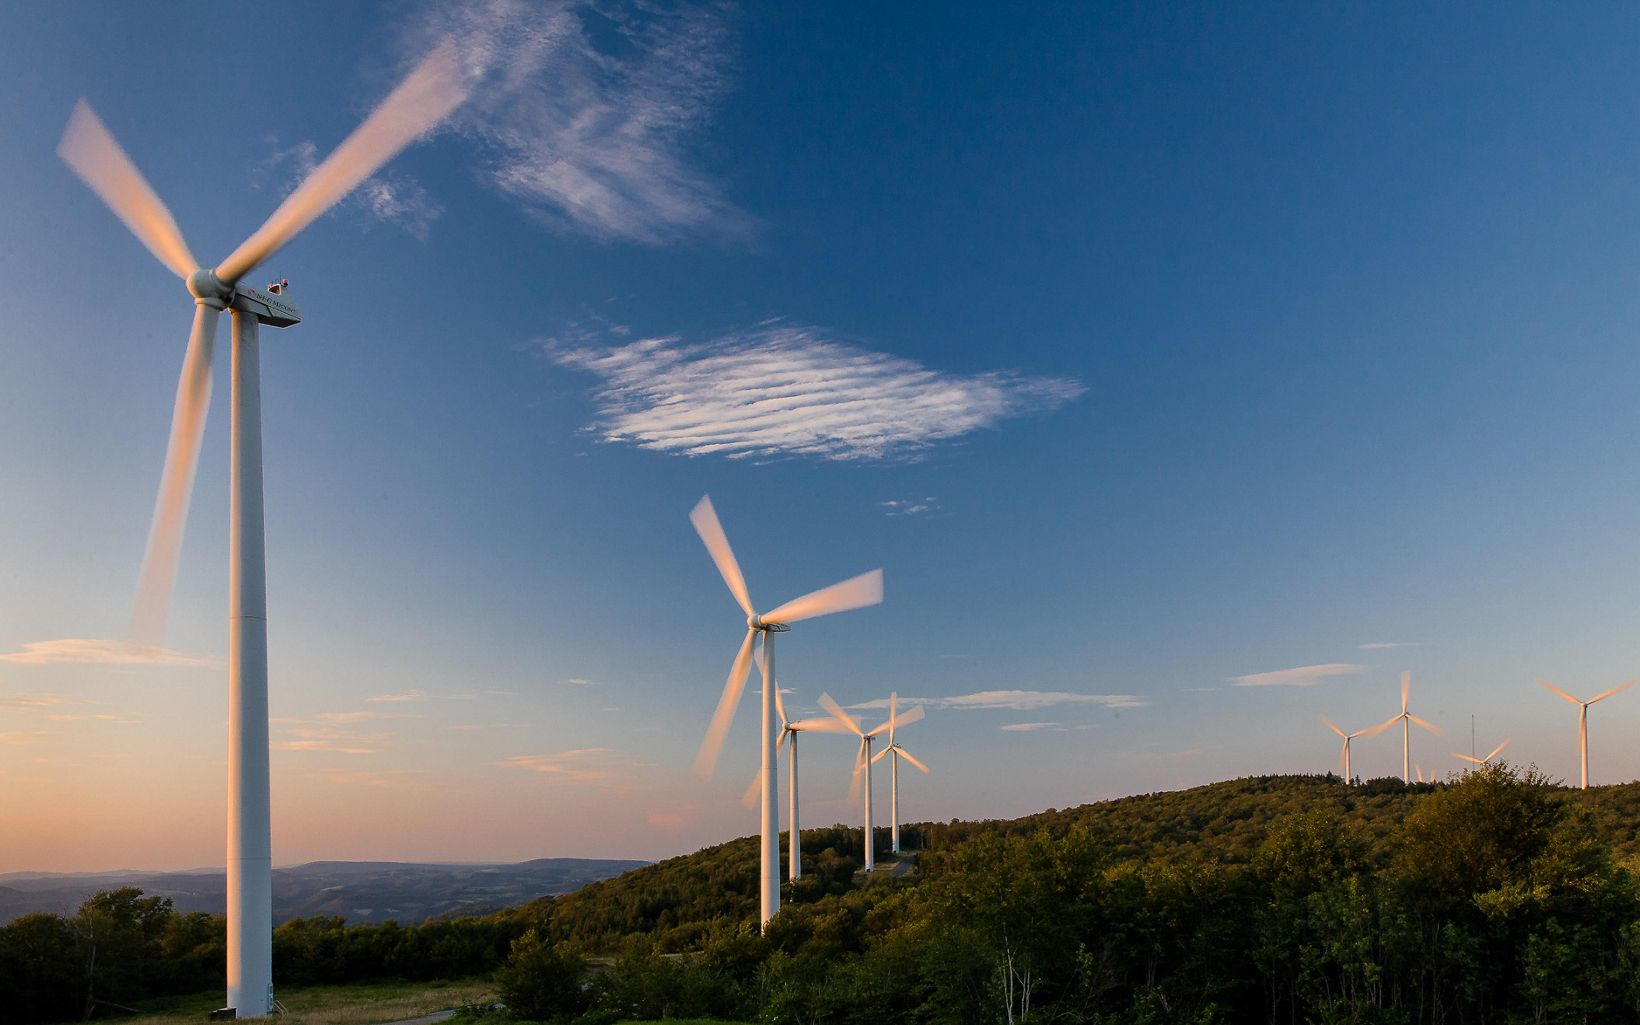 Wind Farm Turbines in West Virginia